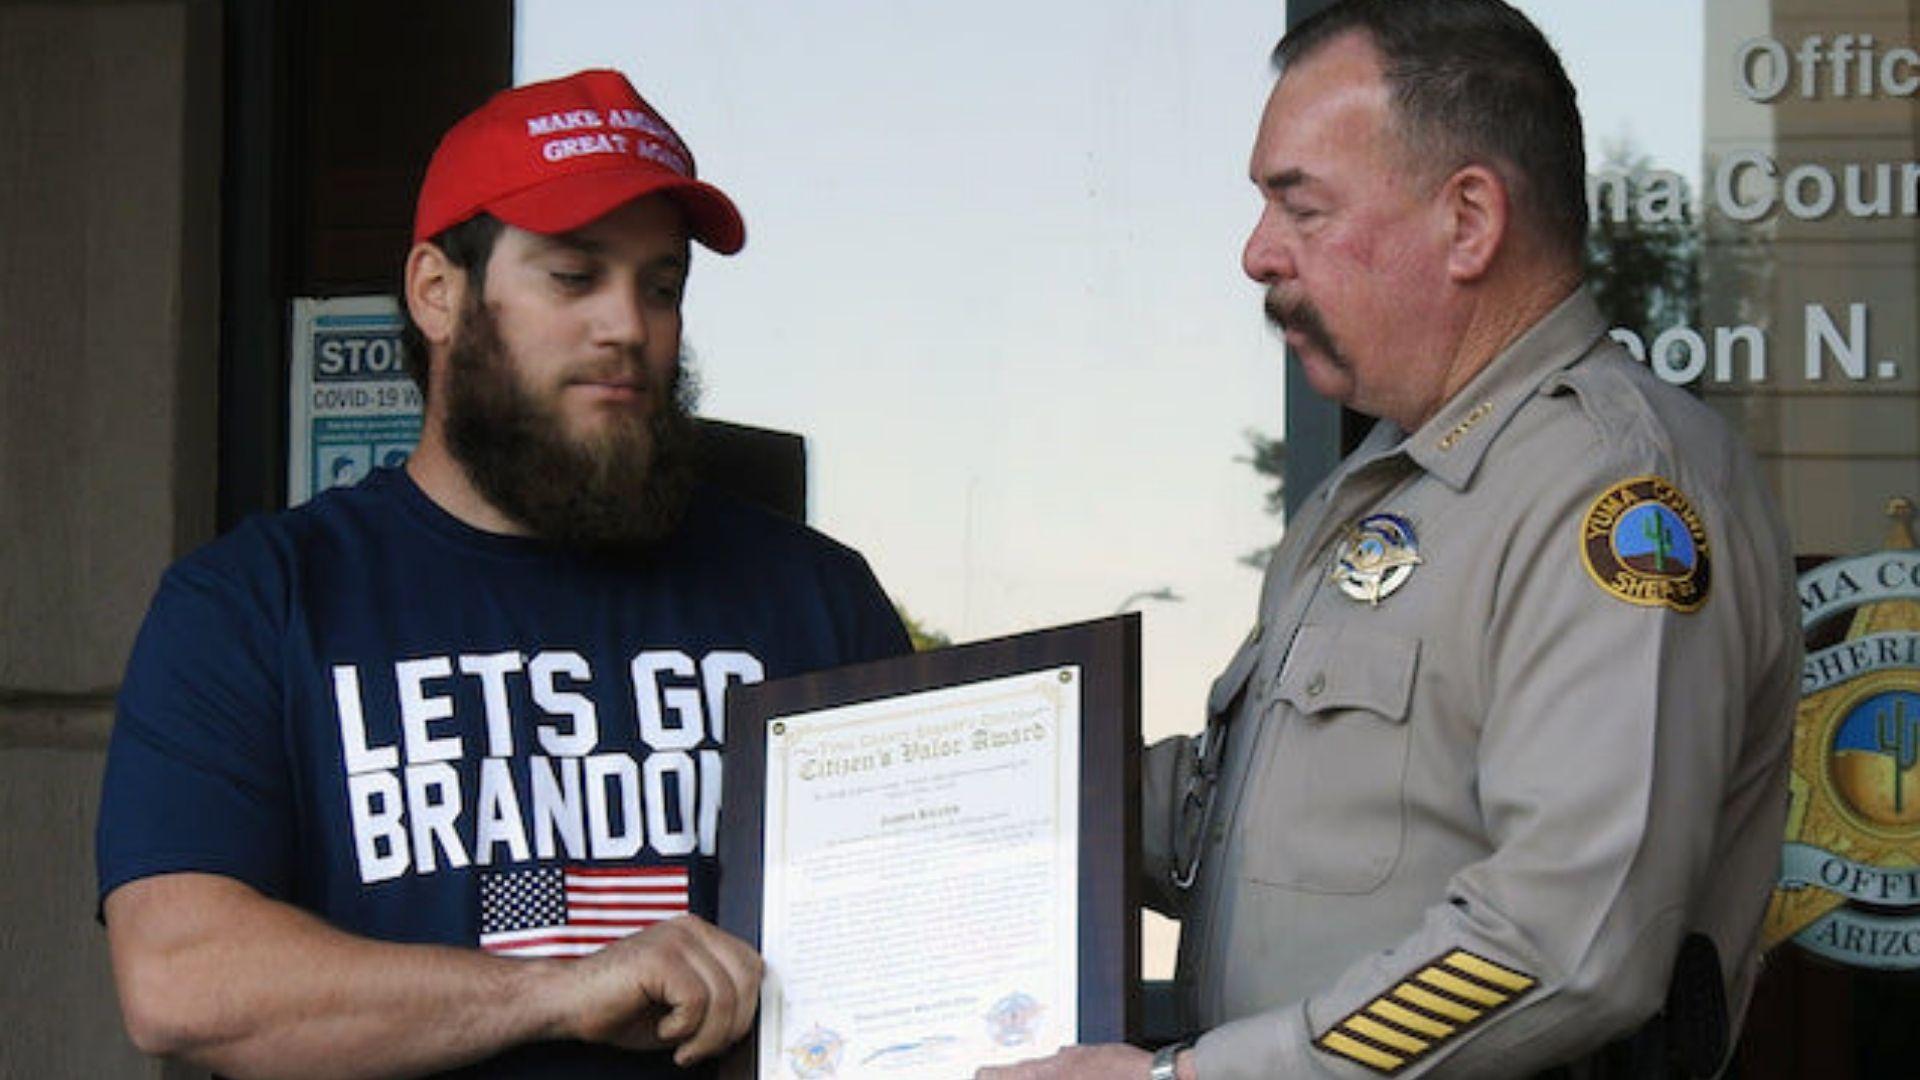 Marine Veteran Wears 'Let's Go Brandon' Shirt To Receive Valor Award For Disarming Robbery Suspect